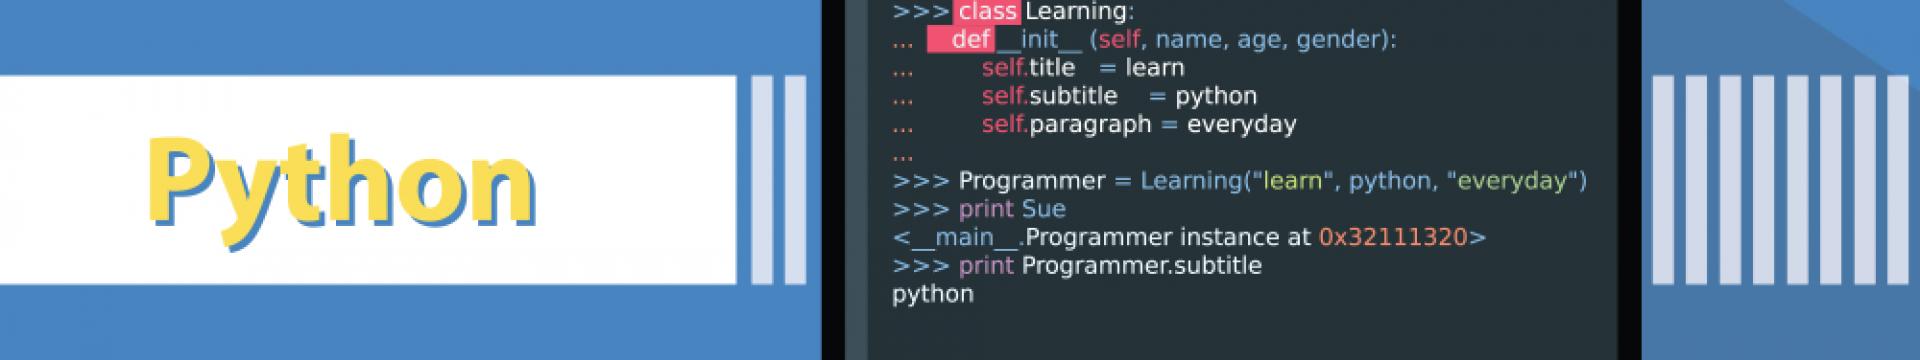 Python Training in Guntur - Best Python Programming Course at Nipuna